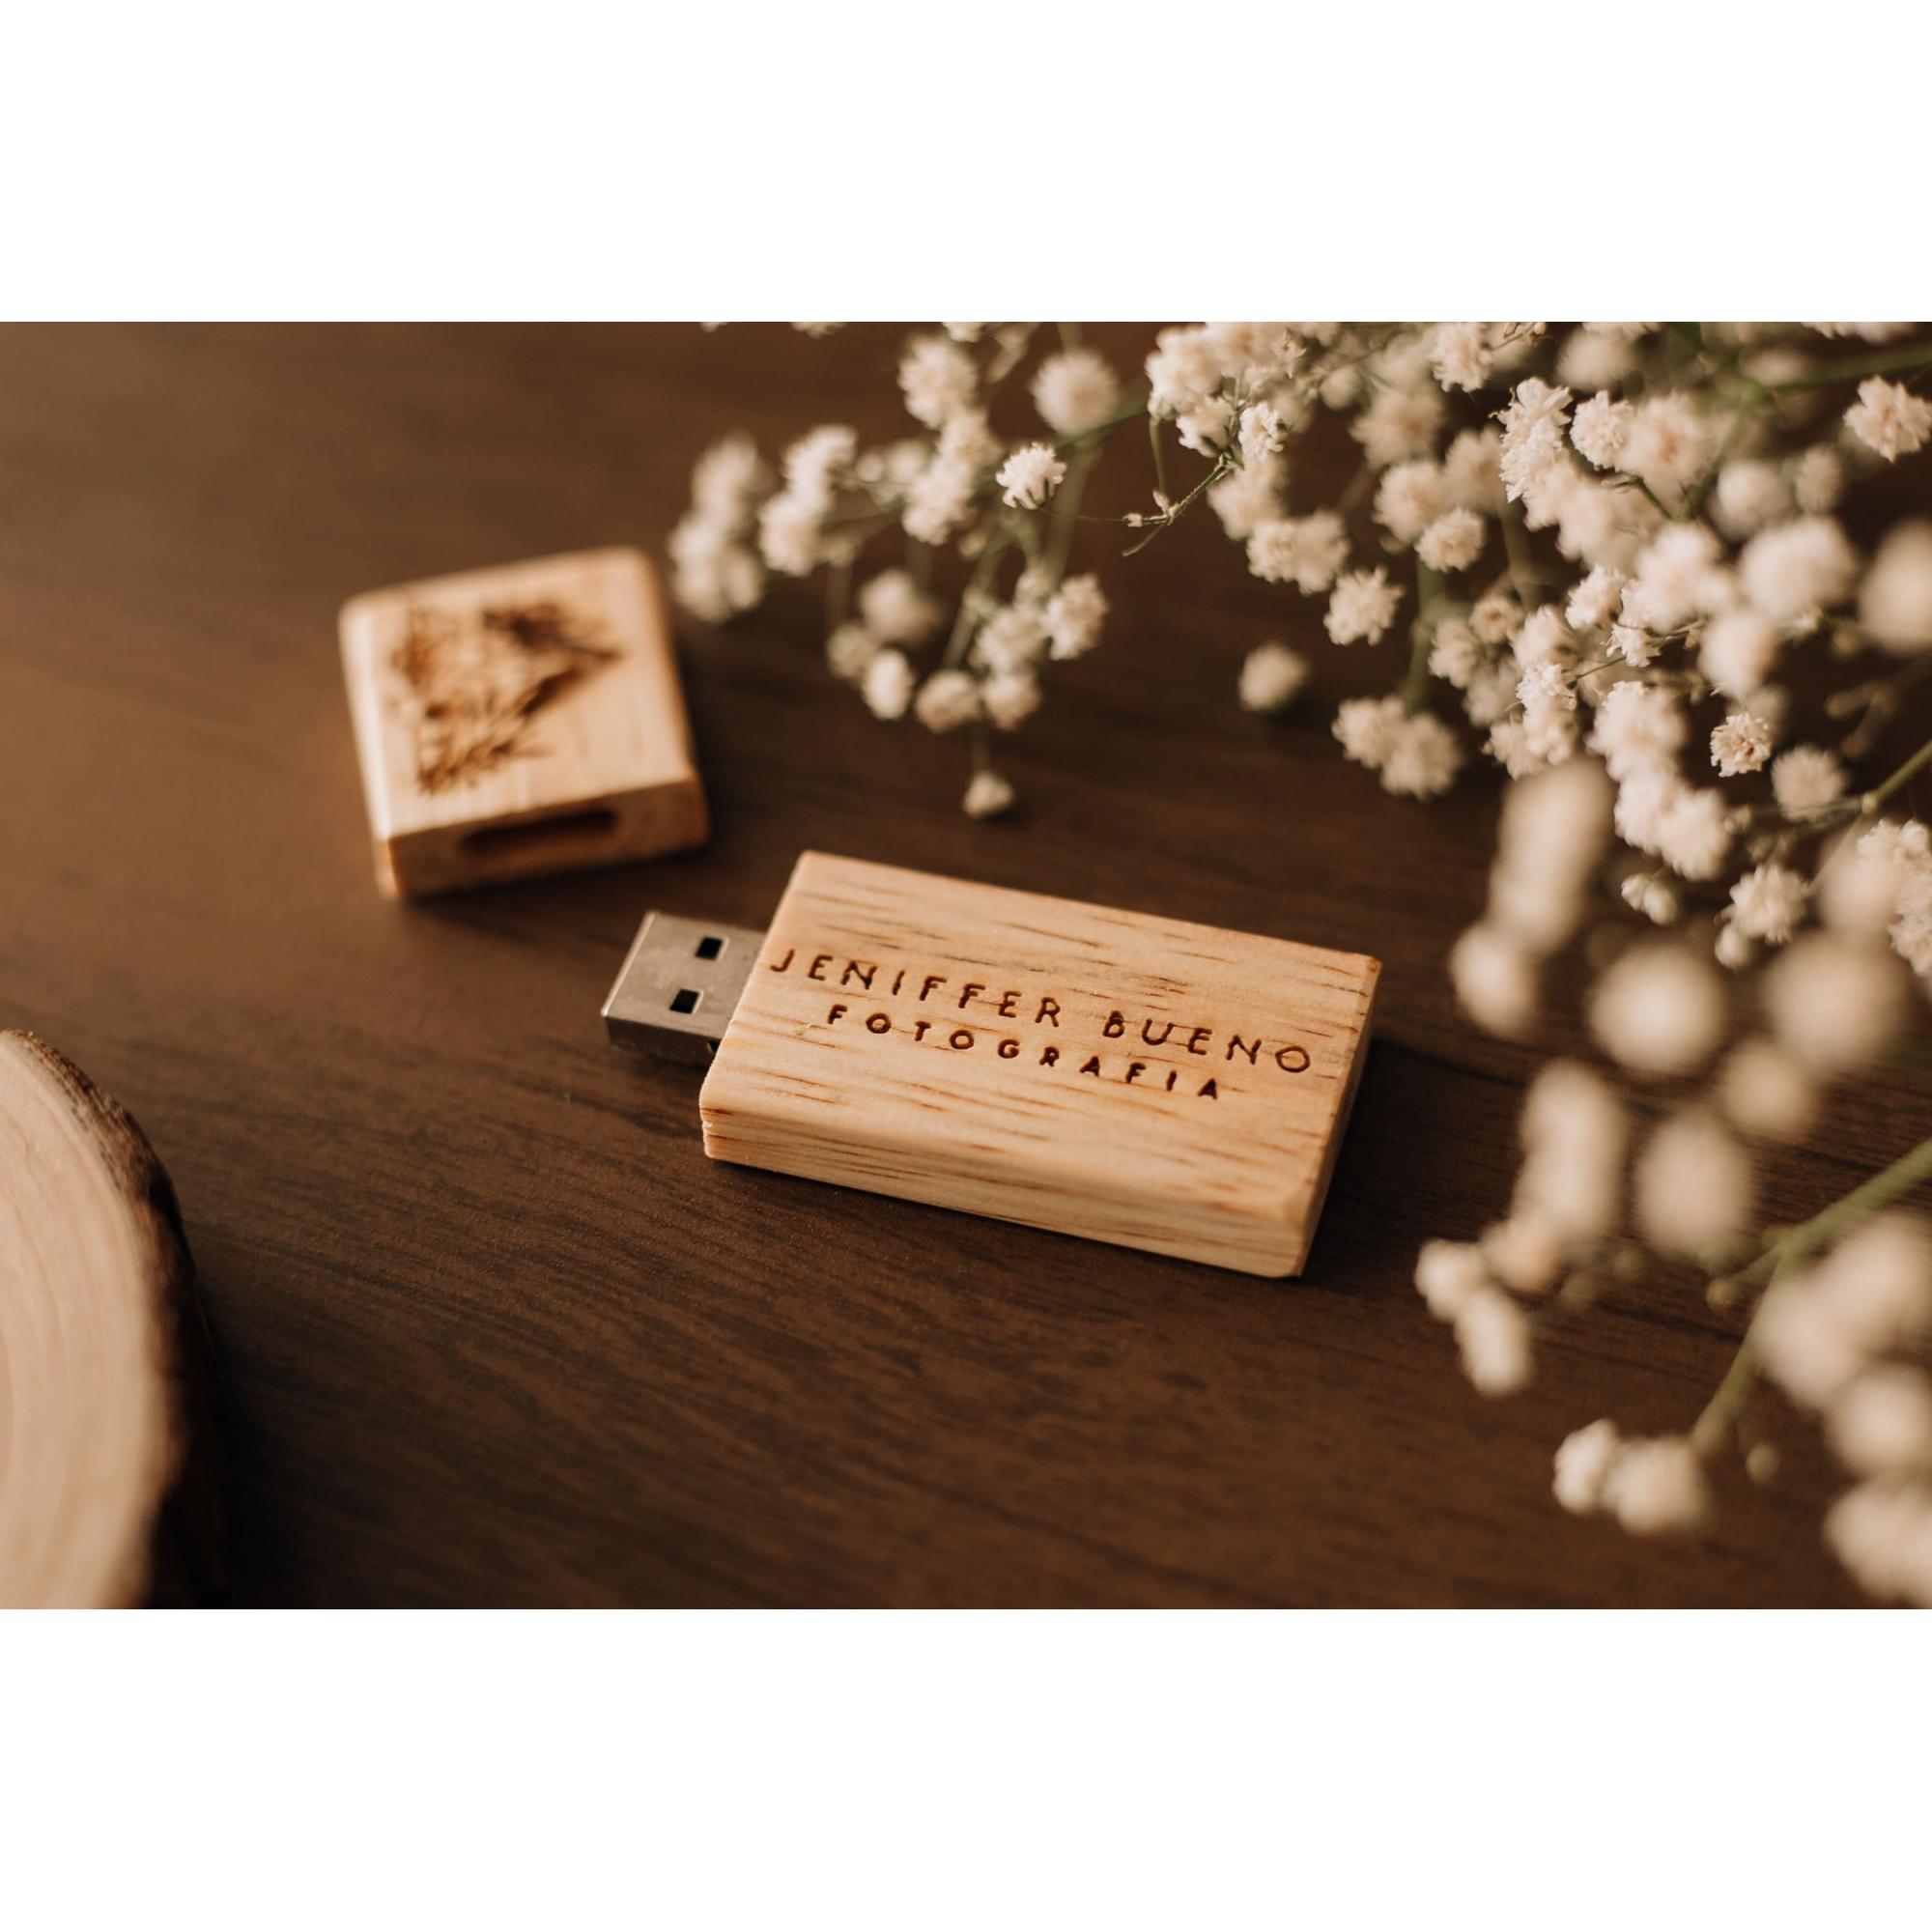 Promoção DOBRO - Pen Drive de Peróba Rosa / Pinus - SanDisk